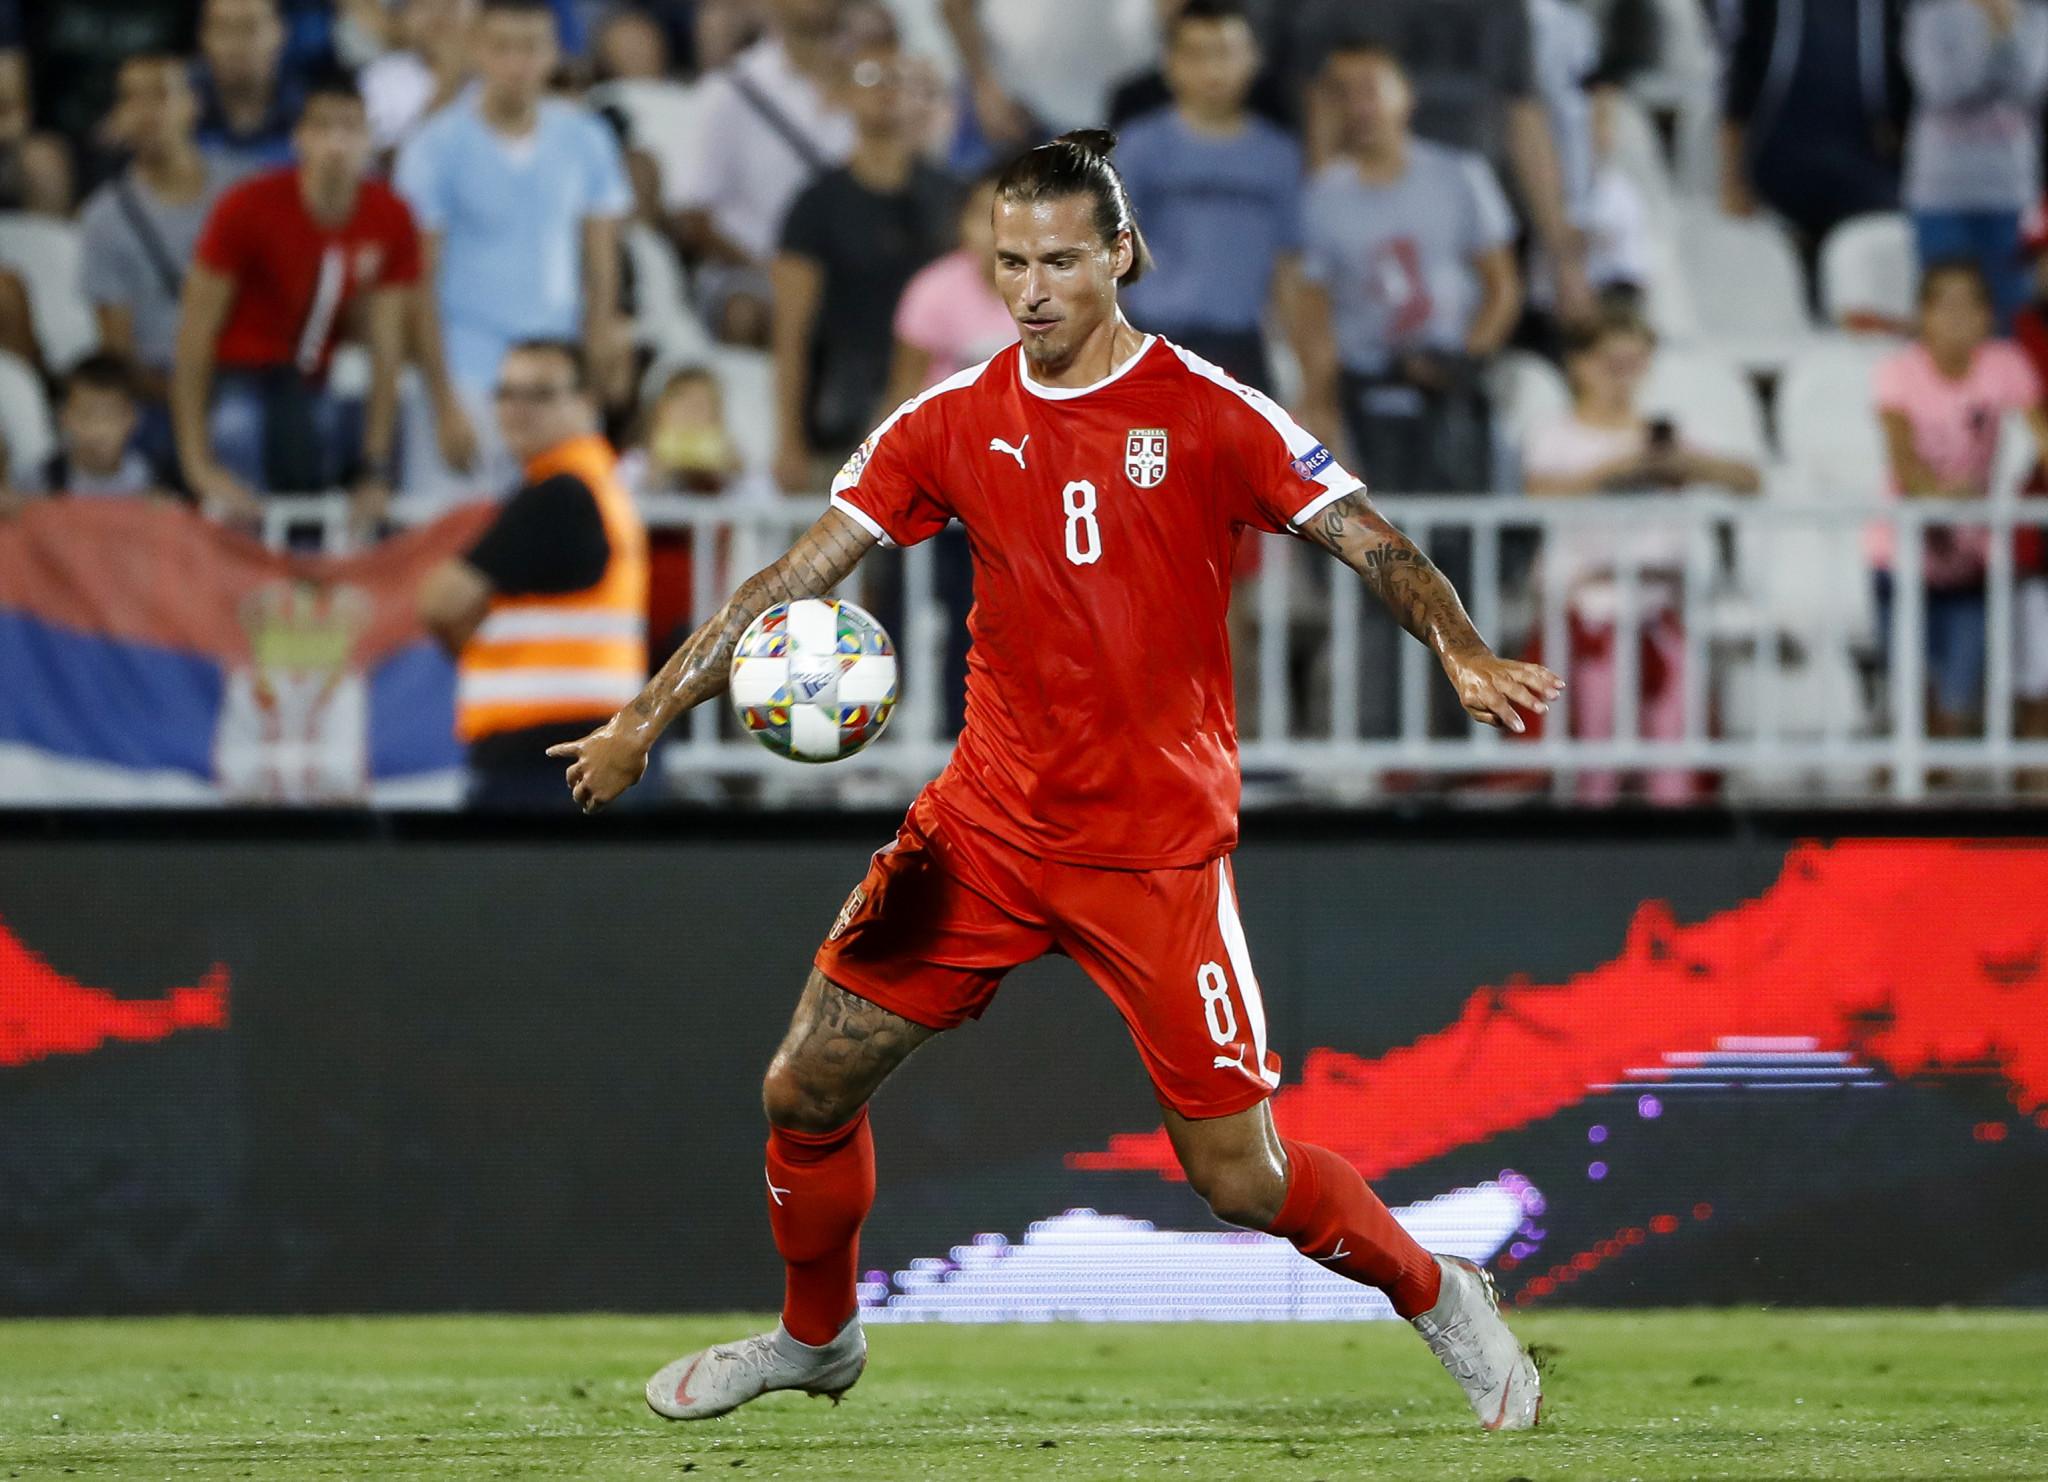 Serbian footballer Prijović given home detention for breaking coronavirus curfew